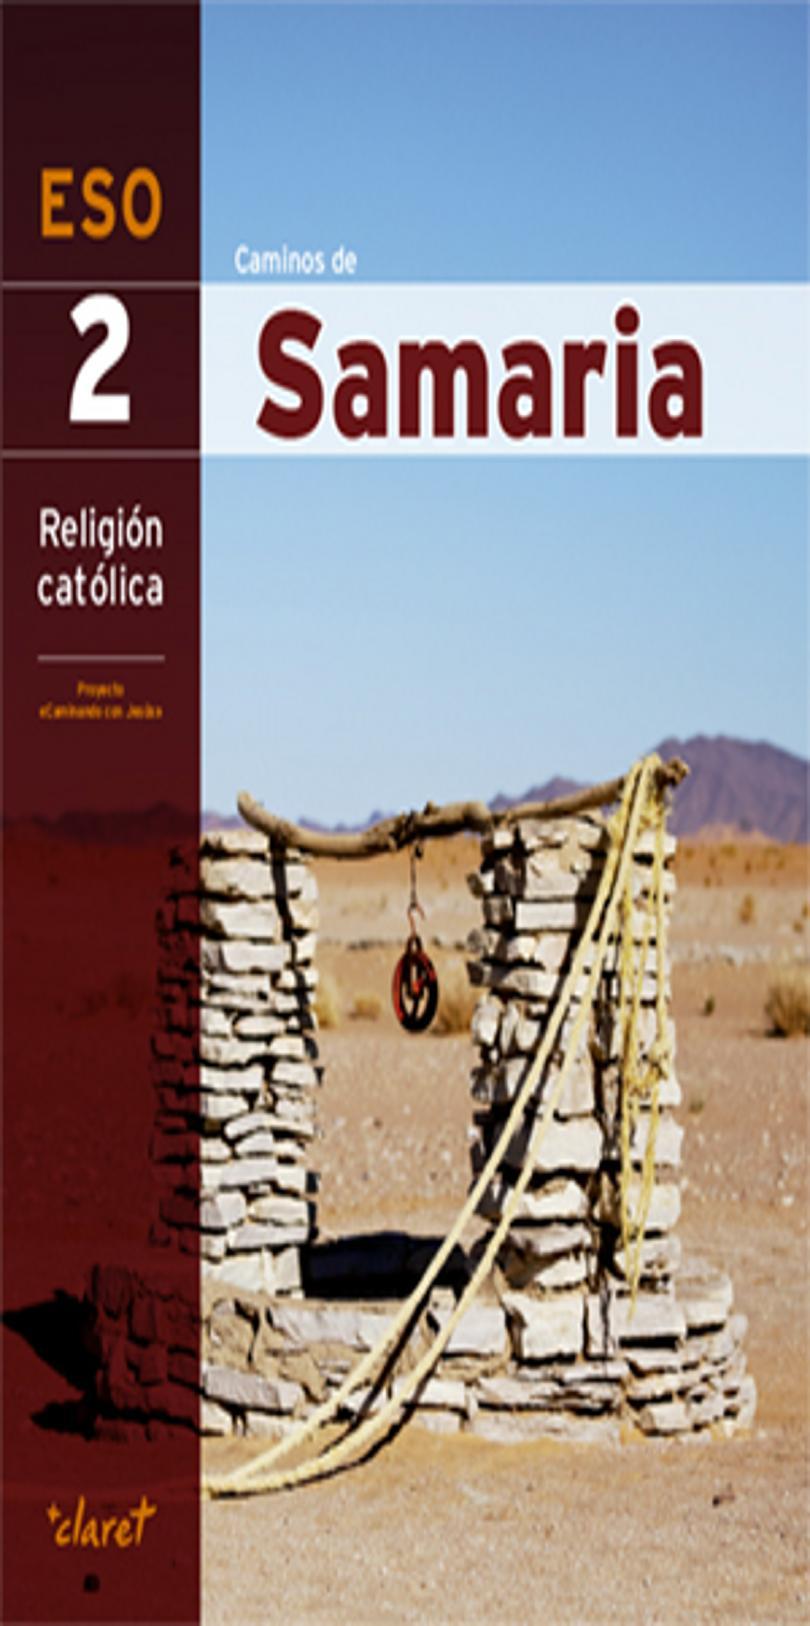 CAMINOS DE SAMARIA 2º ESO RELIGIÓN CATÓLICA - Proy. Caminando con Jesú